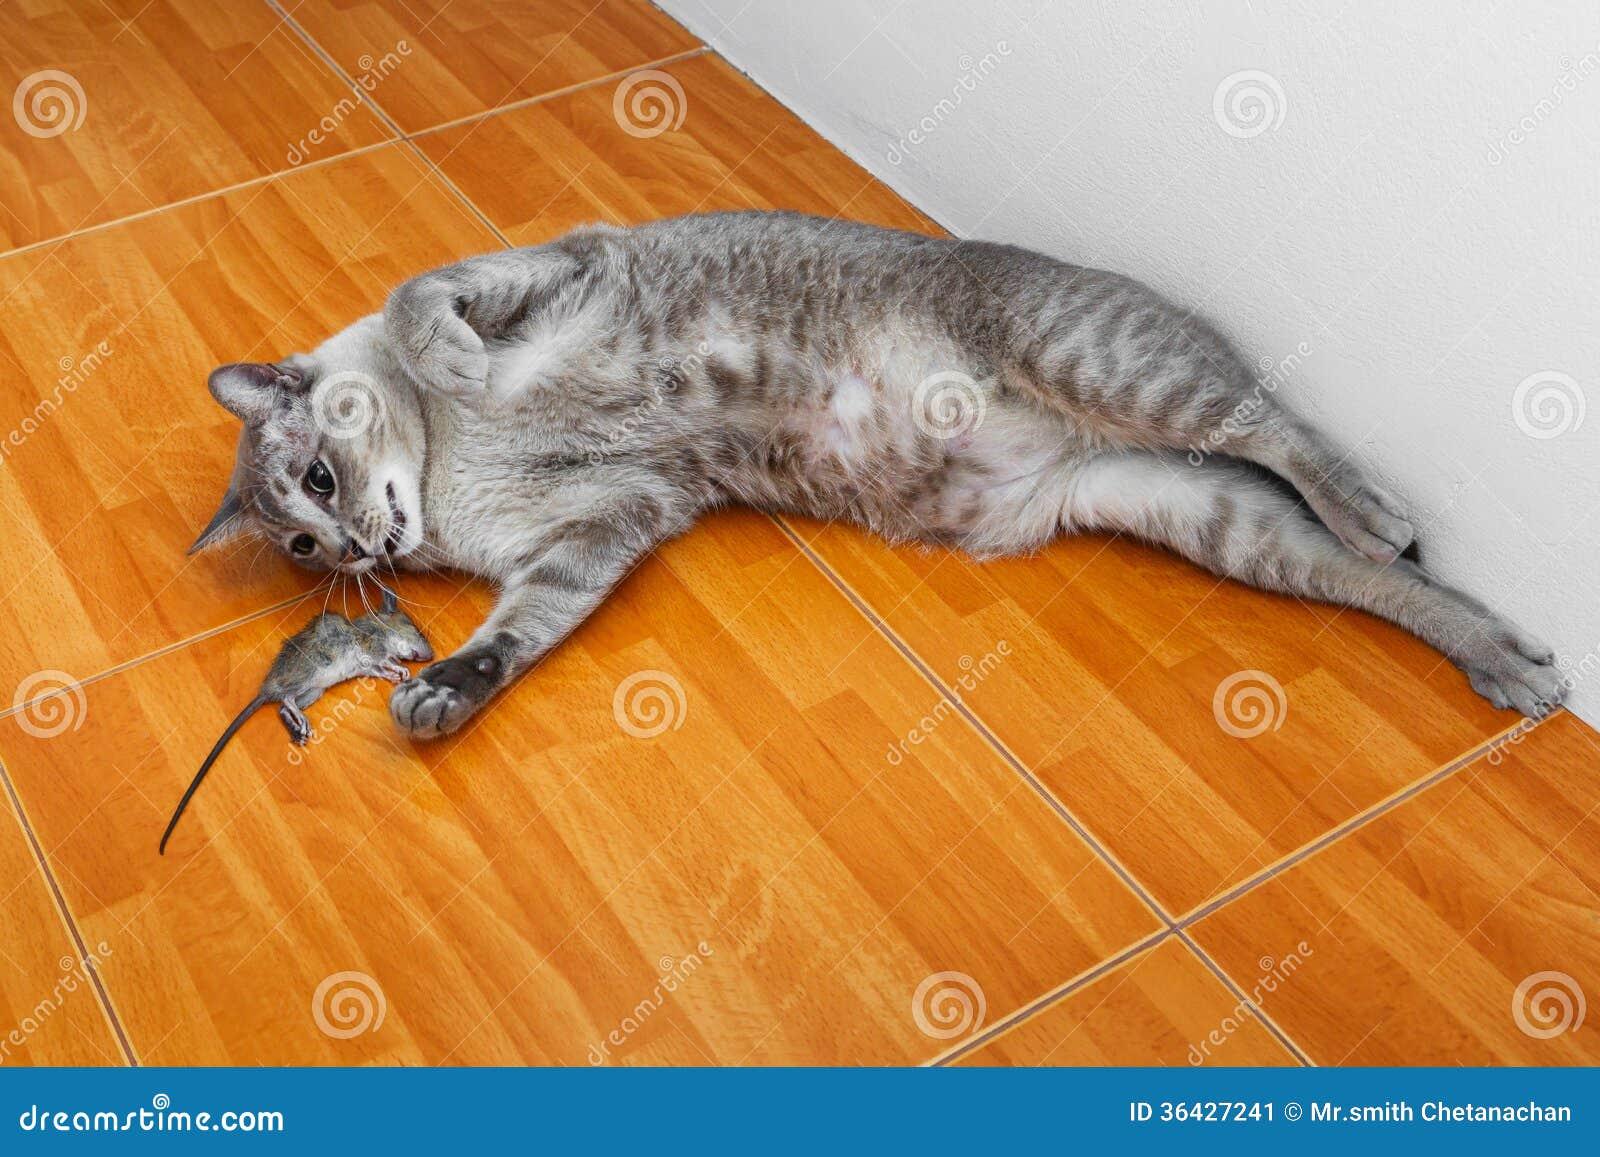 Cat kill rat stock image image 36427241 for Mice in between floors